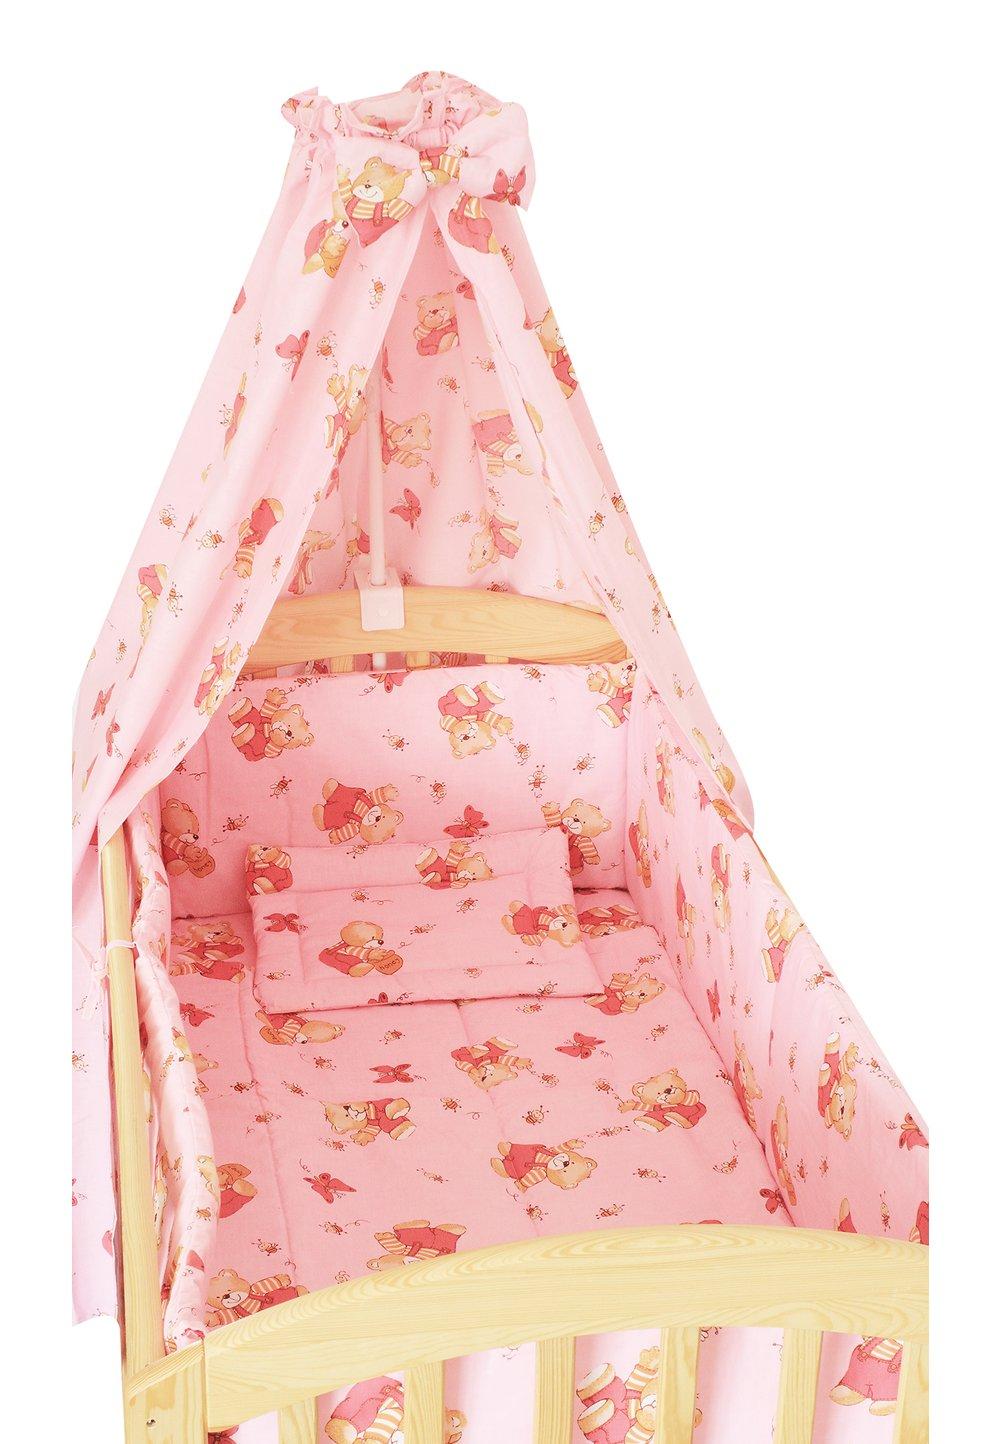 Baldachin patut, ursulet cu albinute roz , 200 x 150 cm imagine